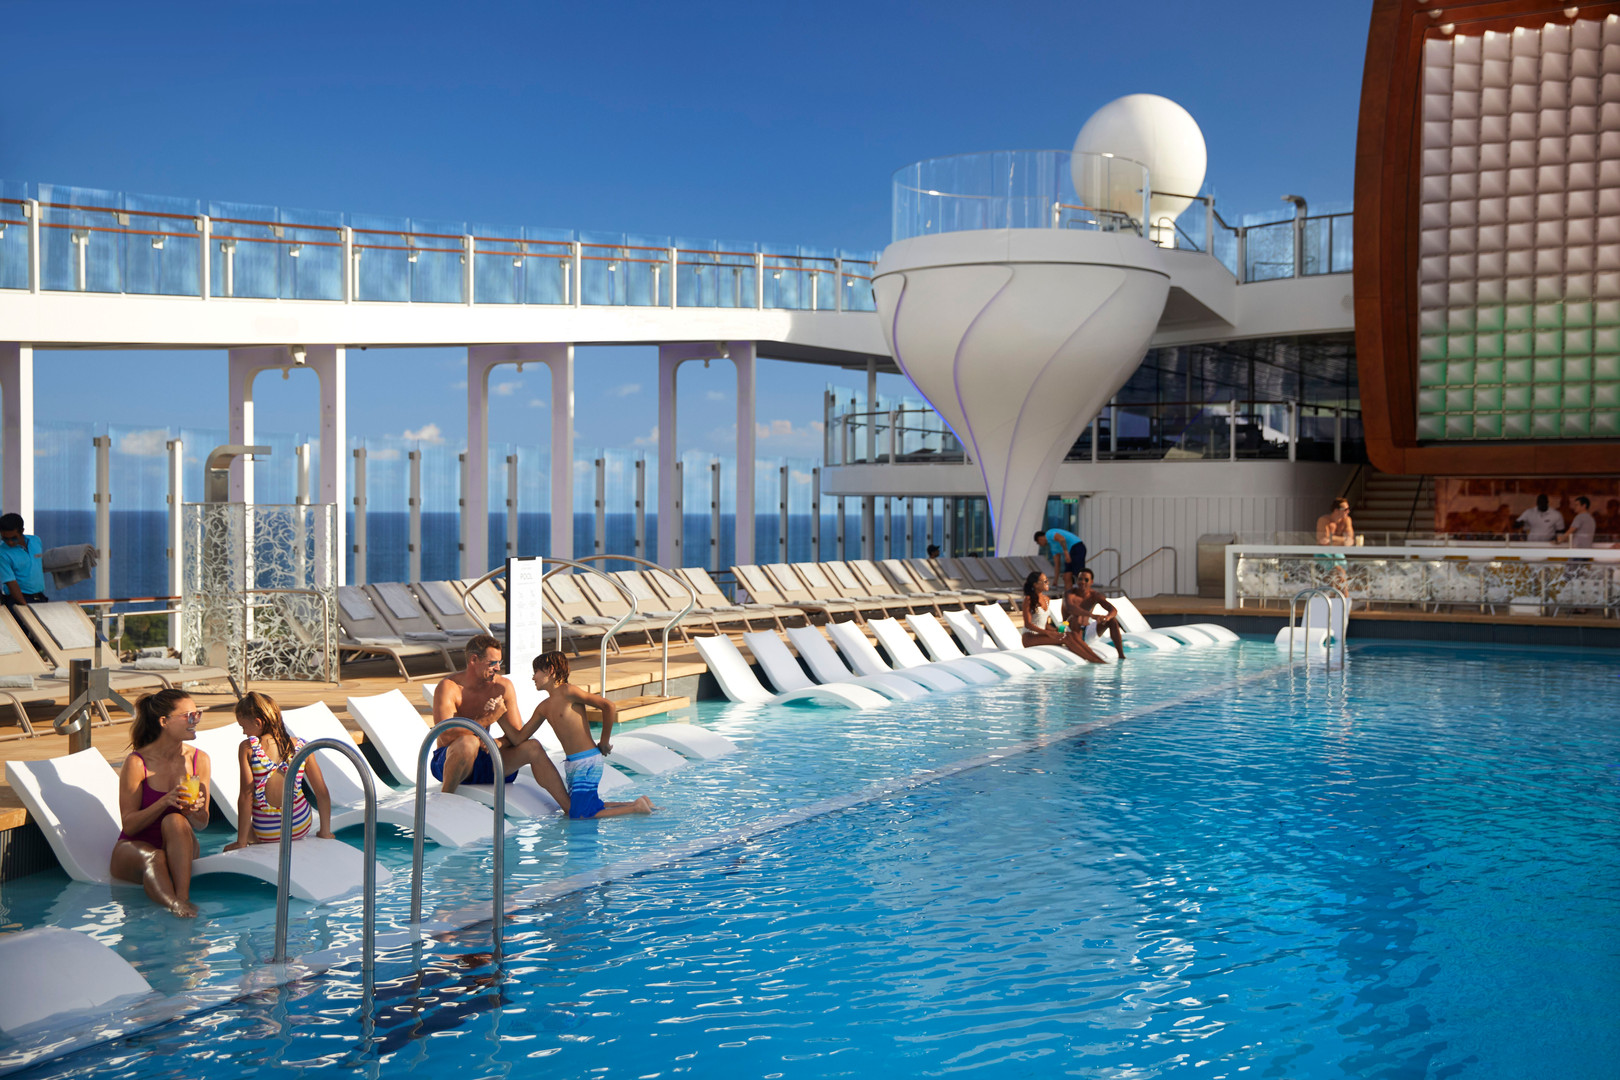 13_CelebrityEdge_Pool-Daytime_8772R - Co